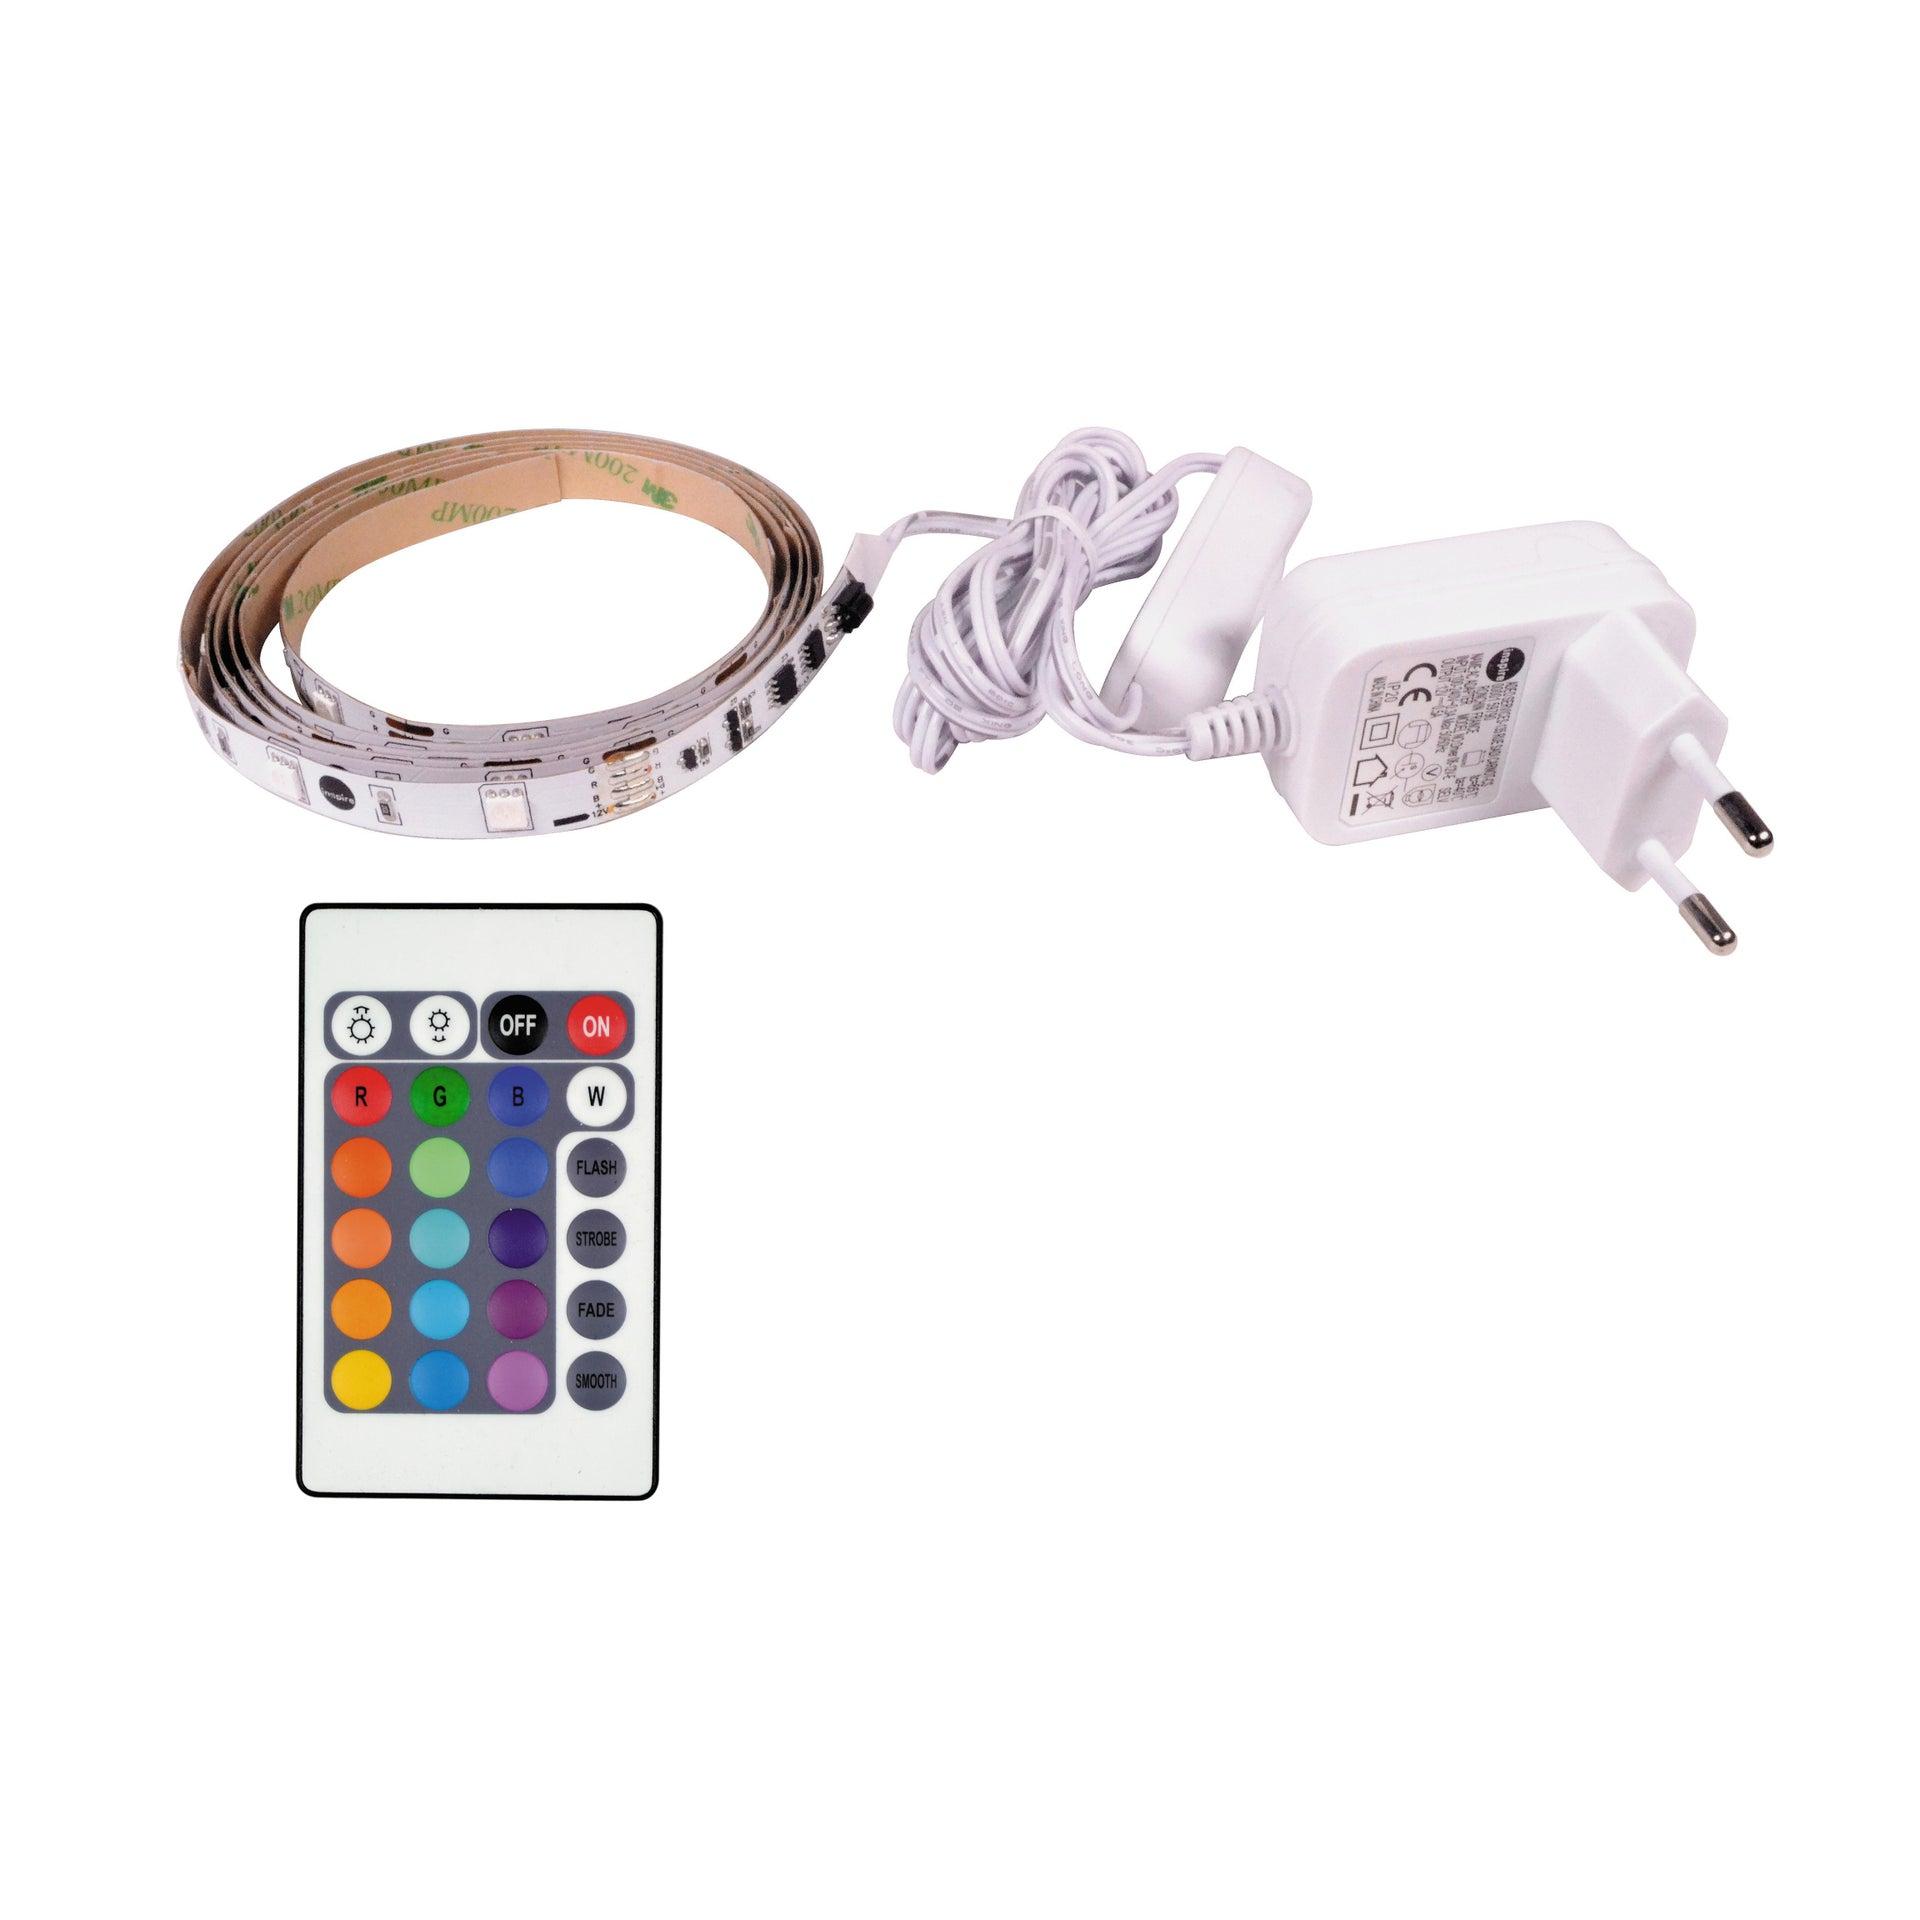 Striscia led 1.5m luce rgb 160LM IP20 - 1